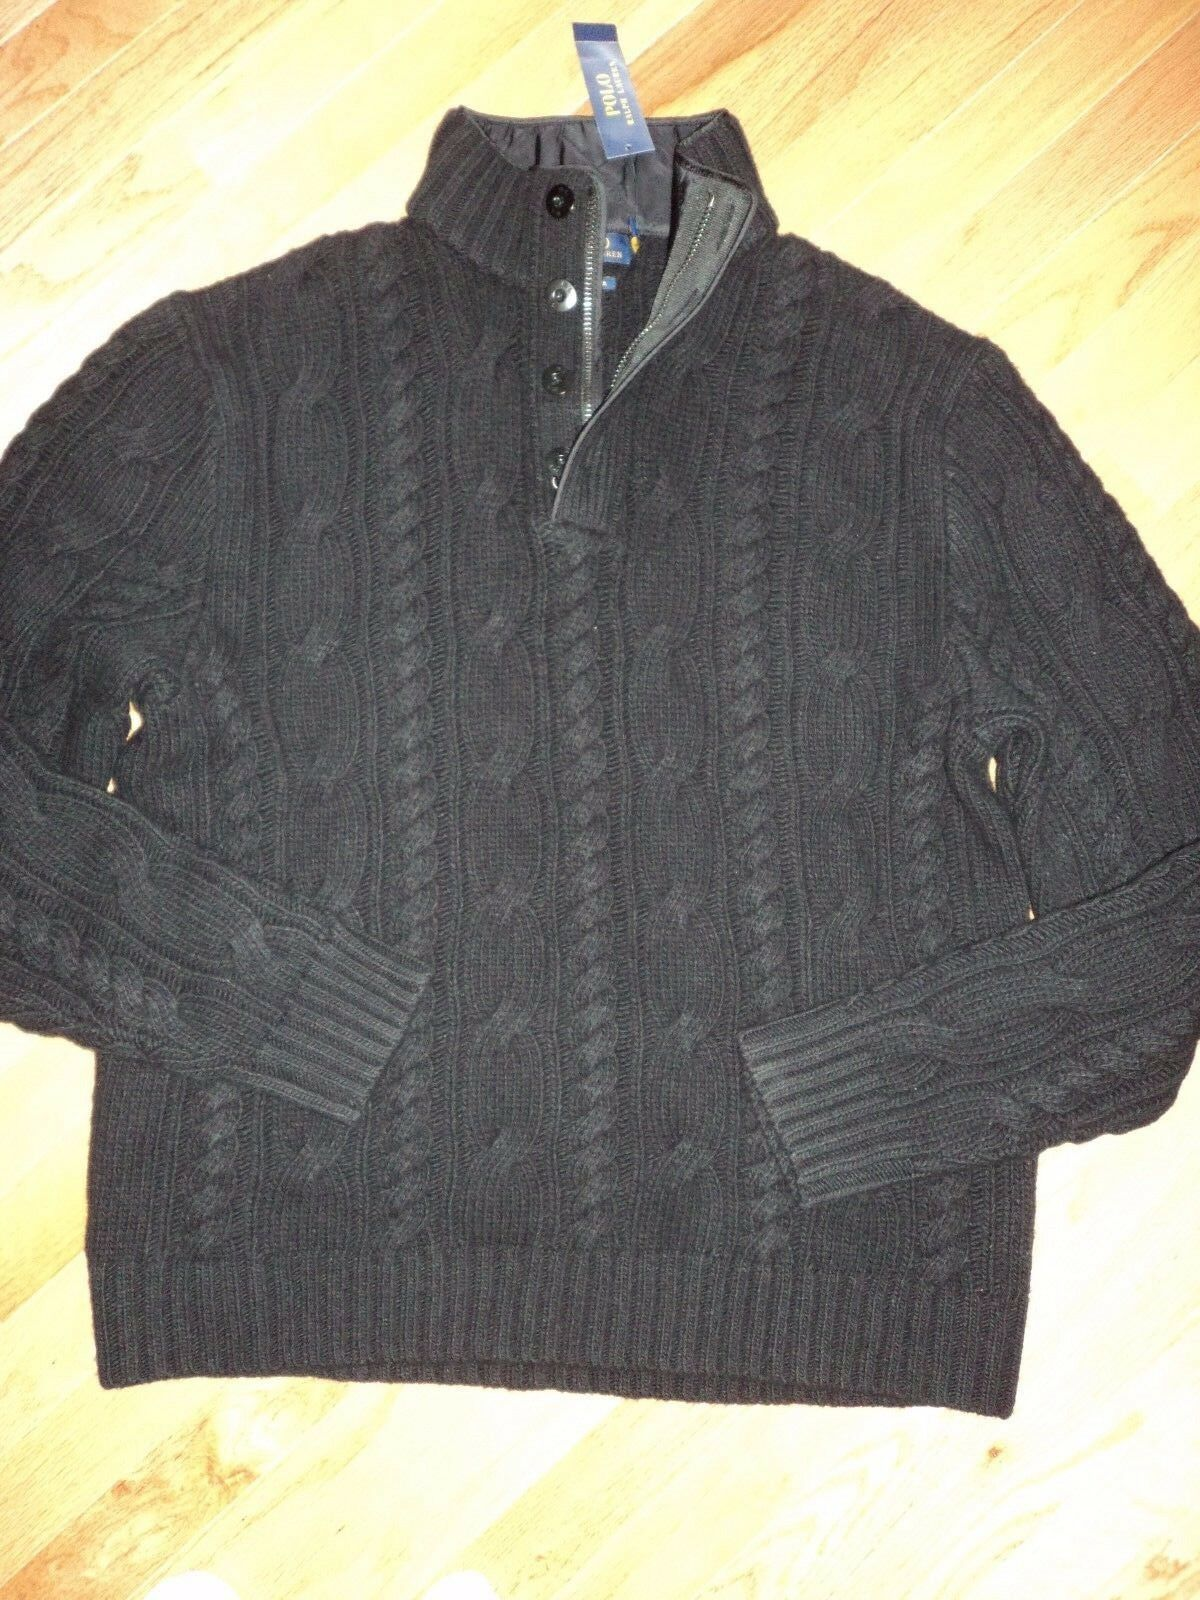 NWT 325 Polo Ralph Lauren 100% Merino Wool Sweater sz XL